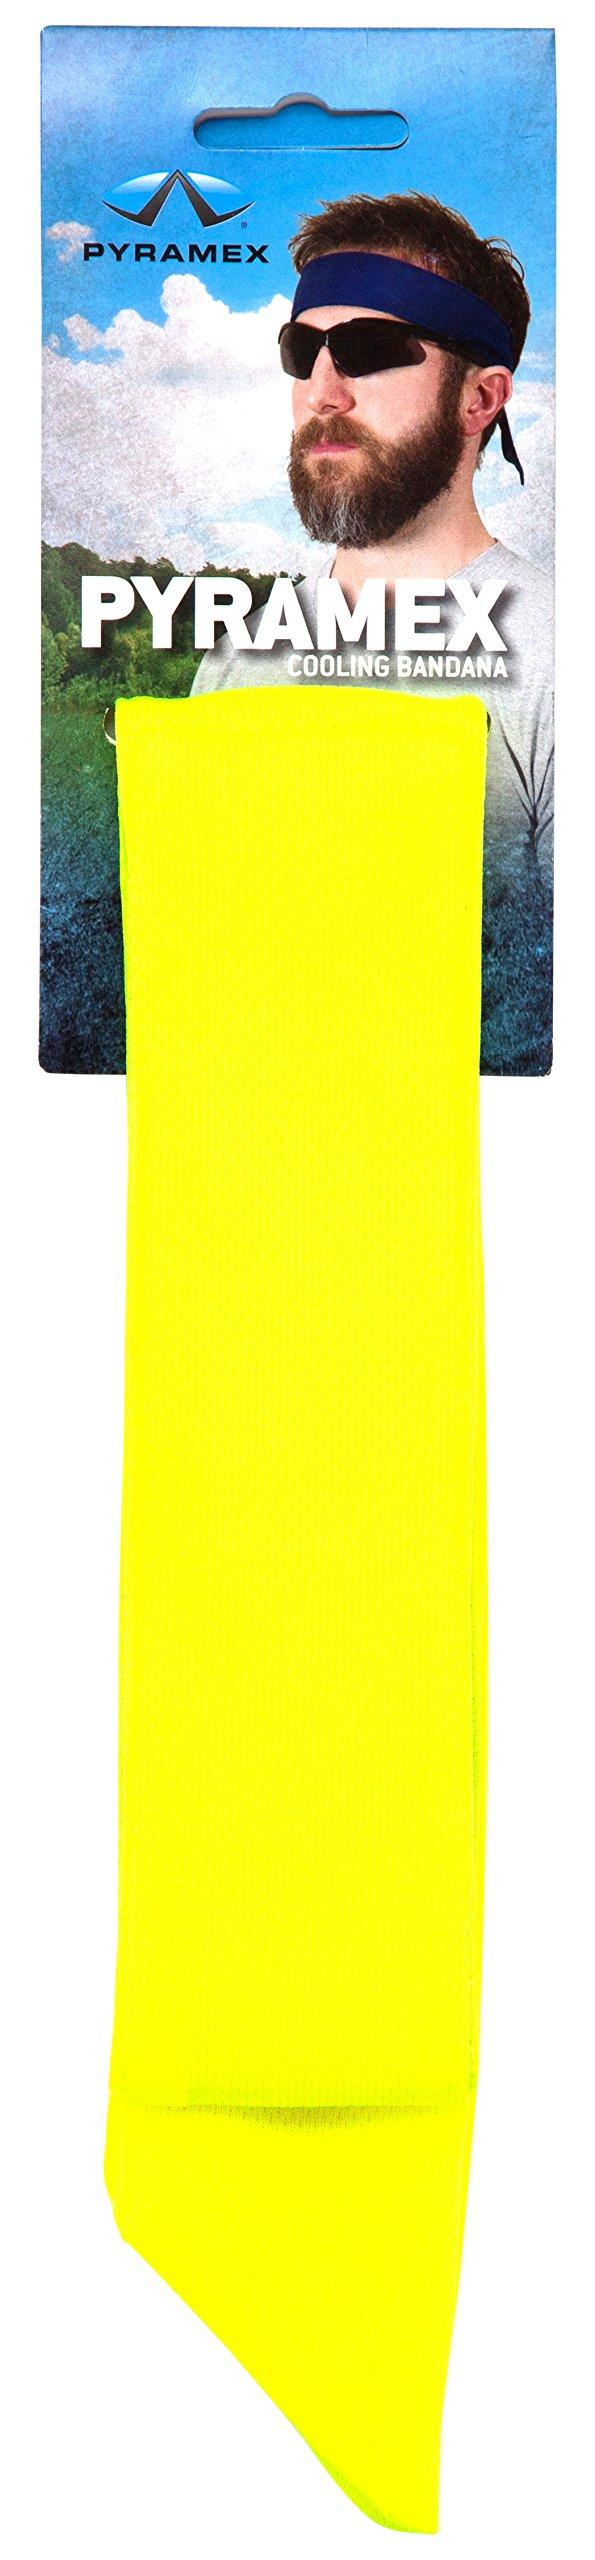 Pyramex Safety CBD12PKLIME Cooling Bandana (12 Pack), Lime